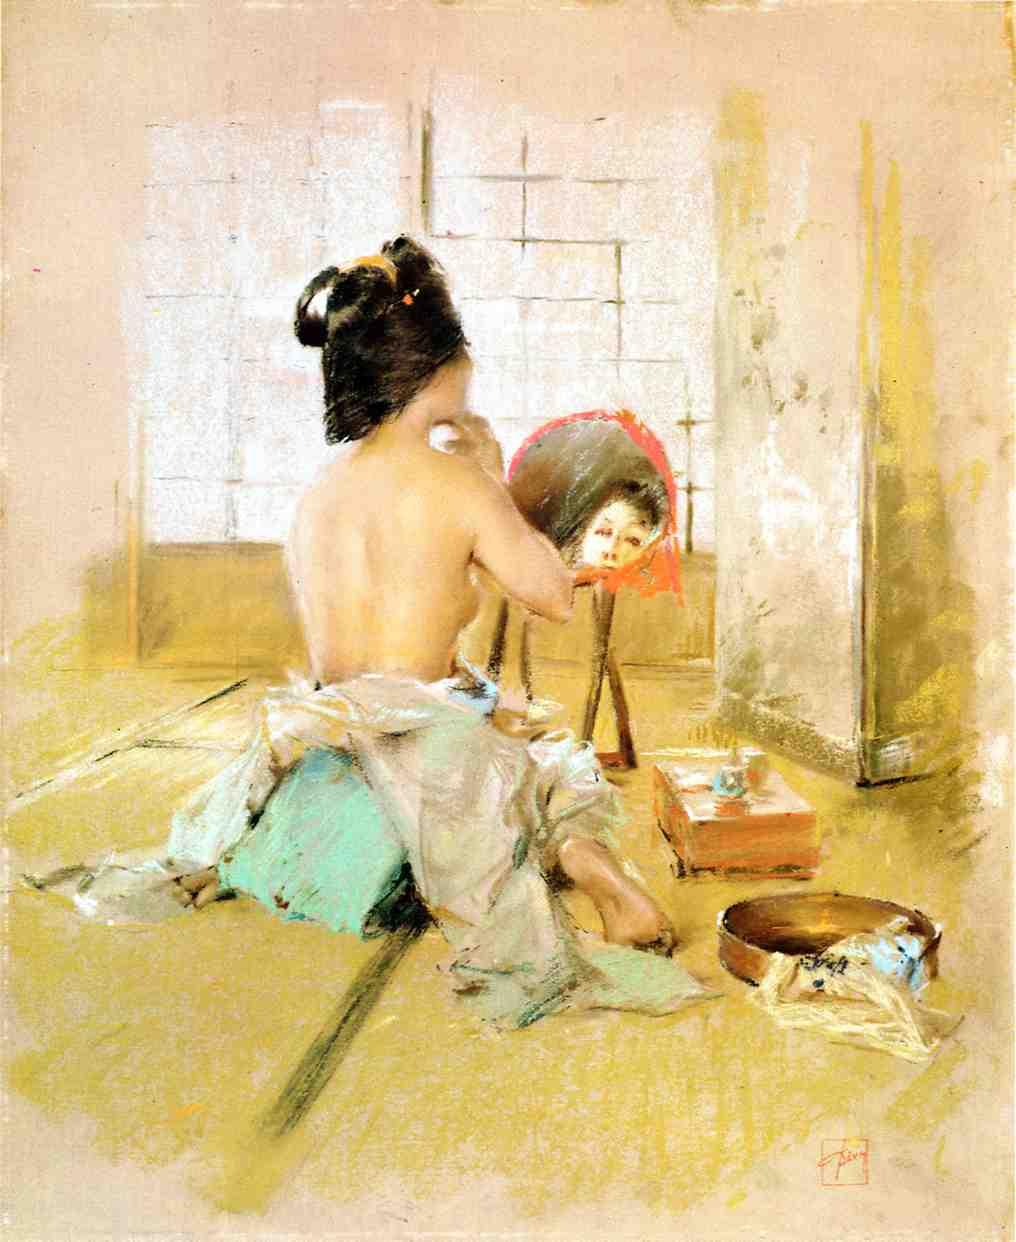 Geisha at Her Toilet | Robert Frederick Blum | Oil Painting